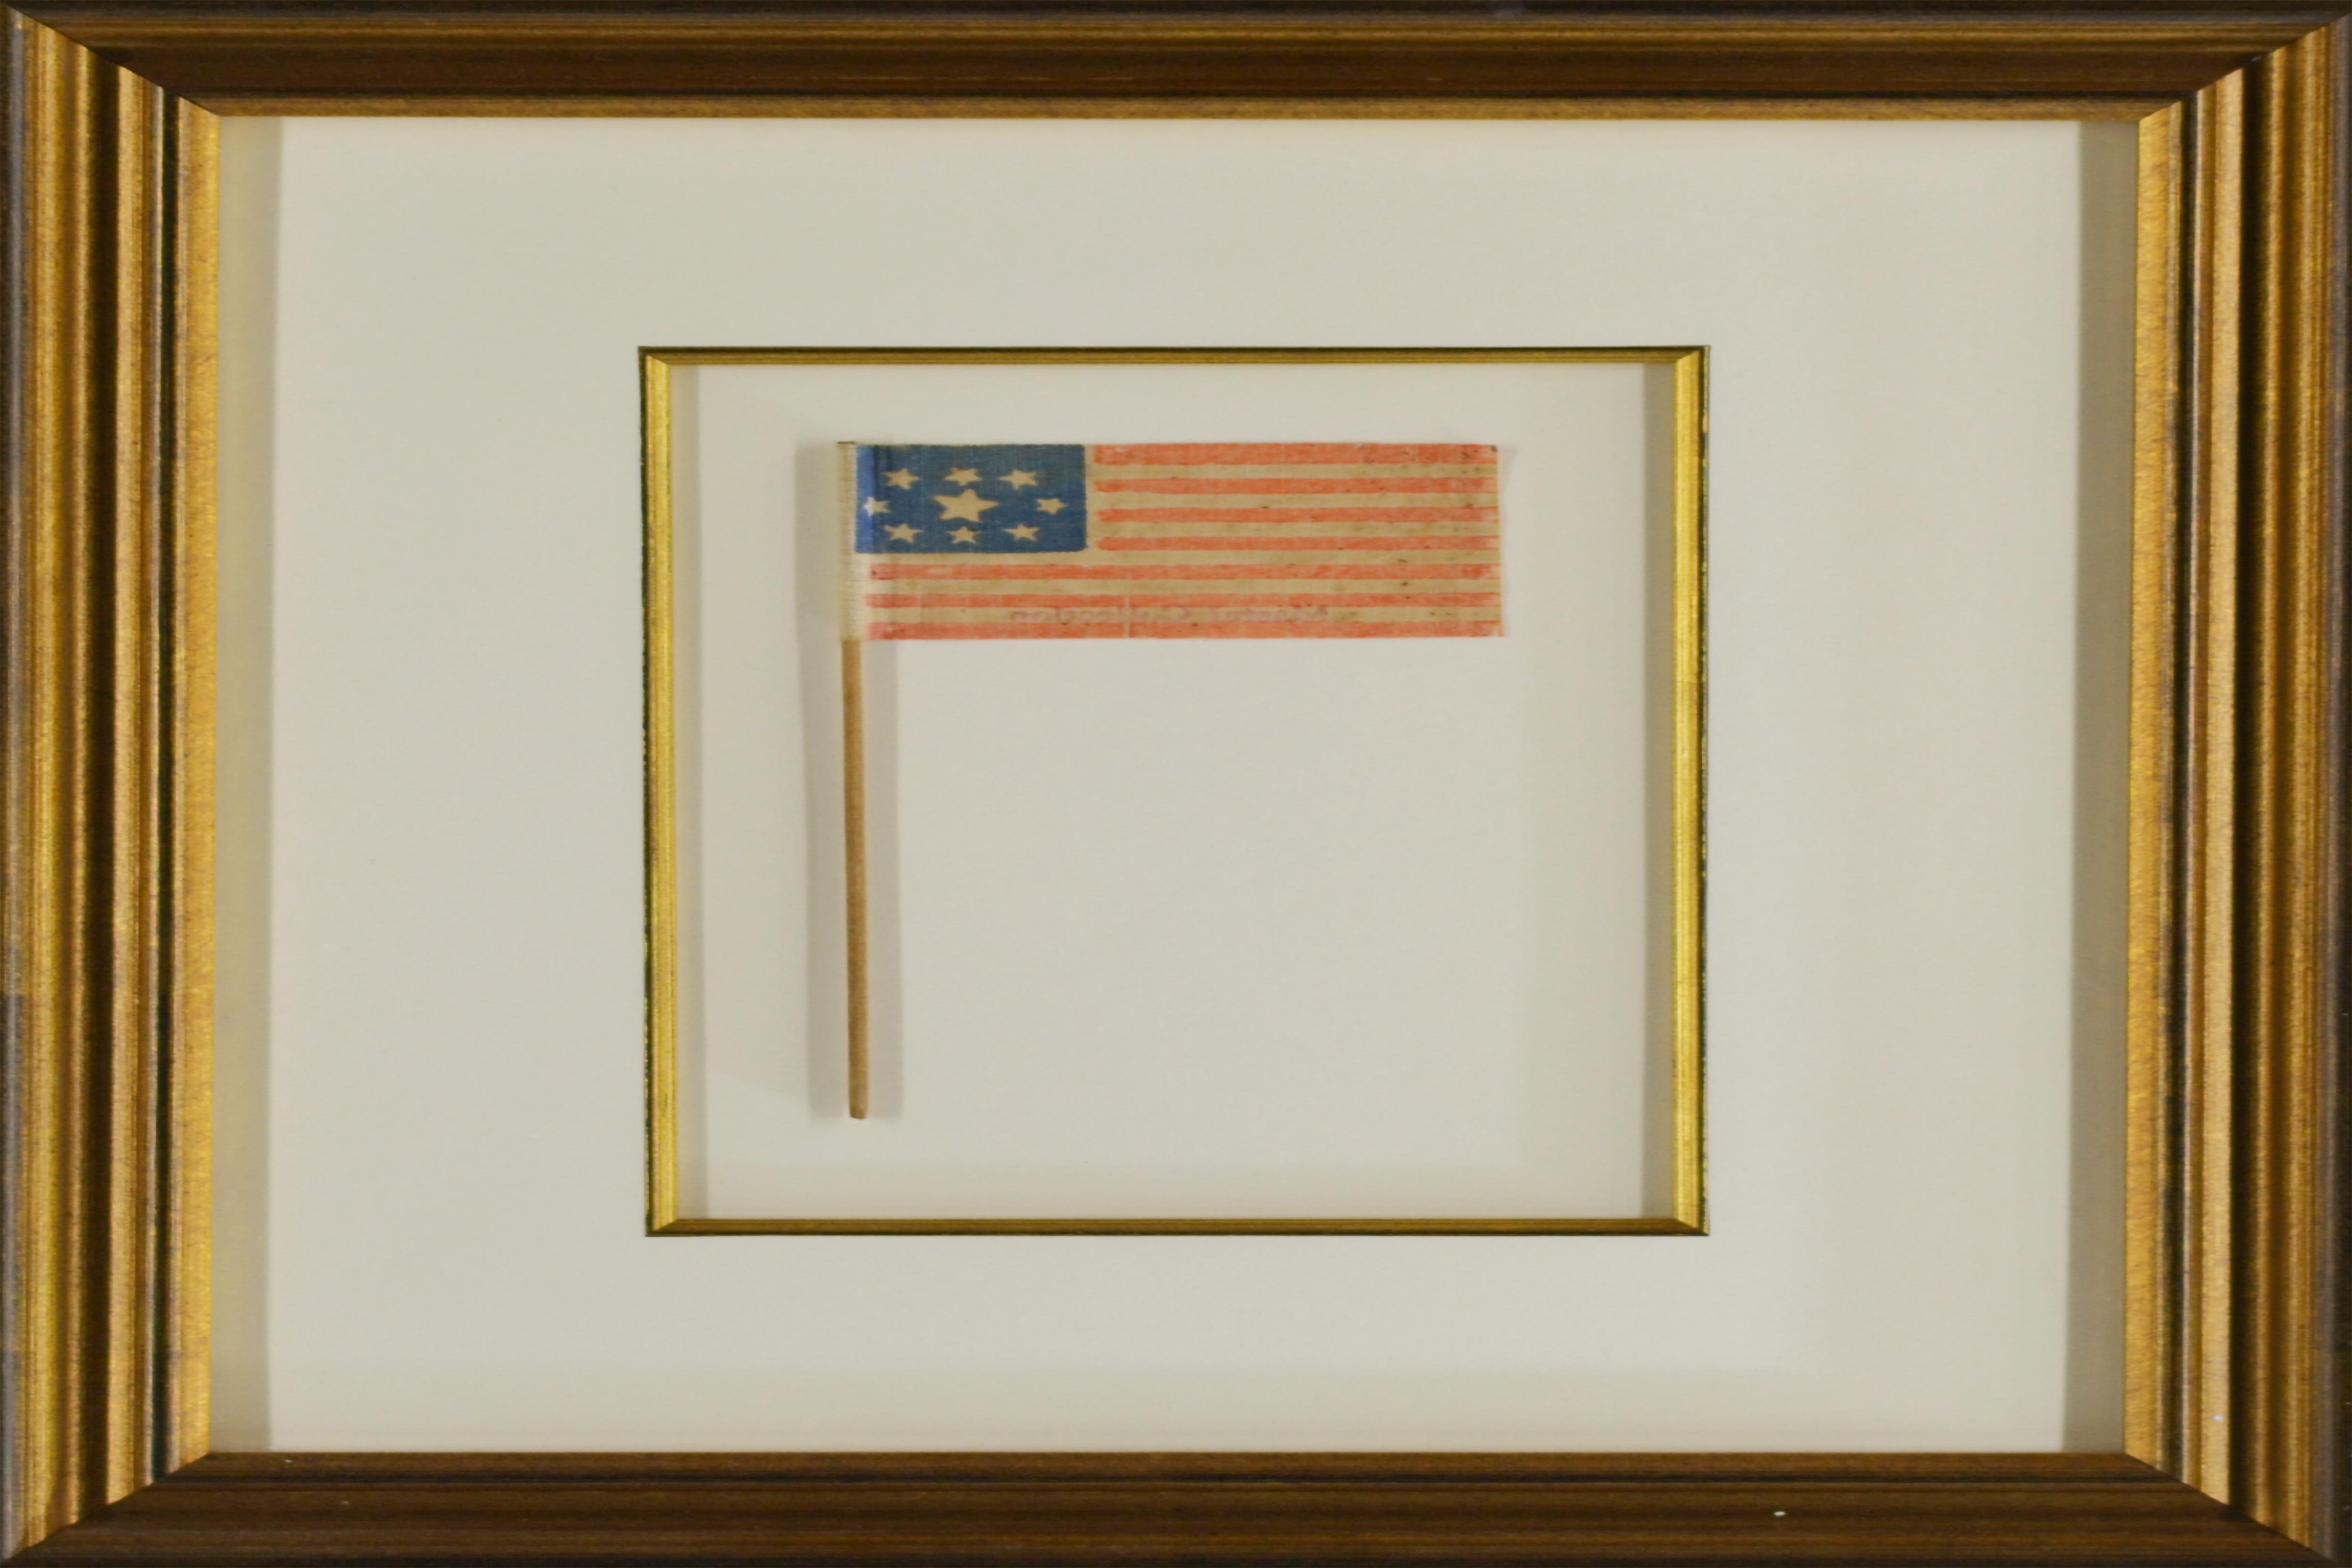 Rare 9 Star Civil War era Flag / SKU 10365 - Historical